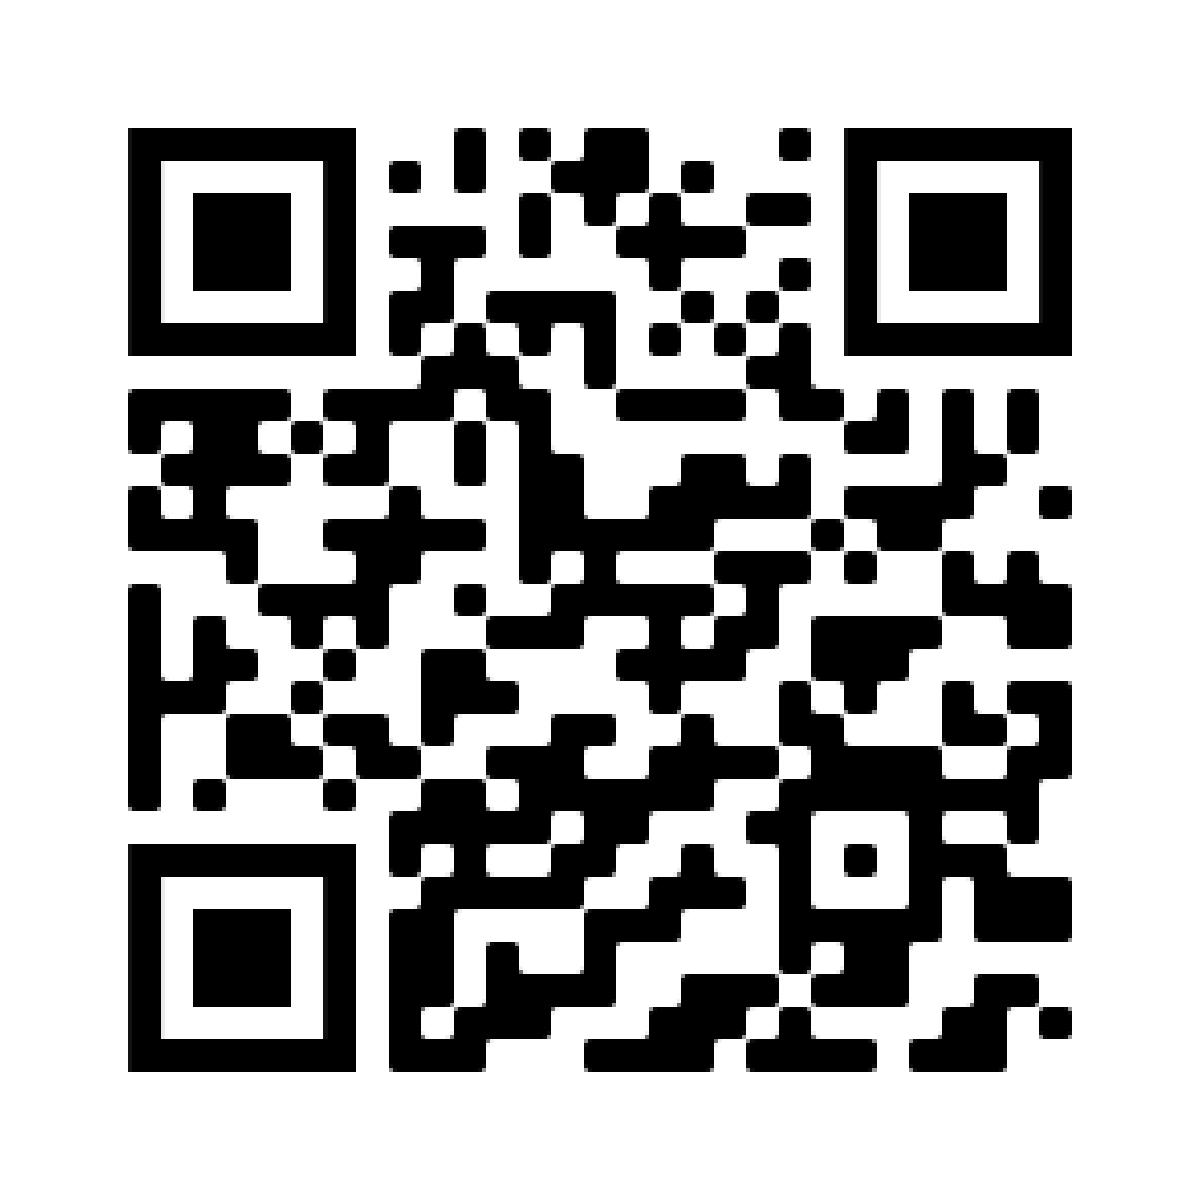 QLess QR code